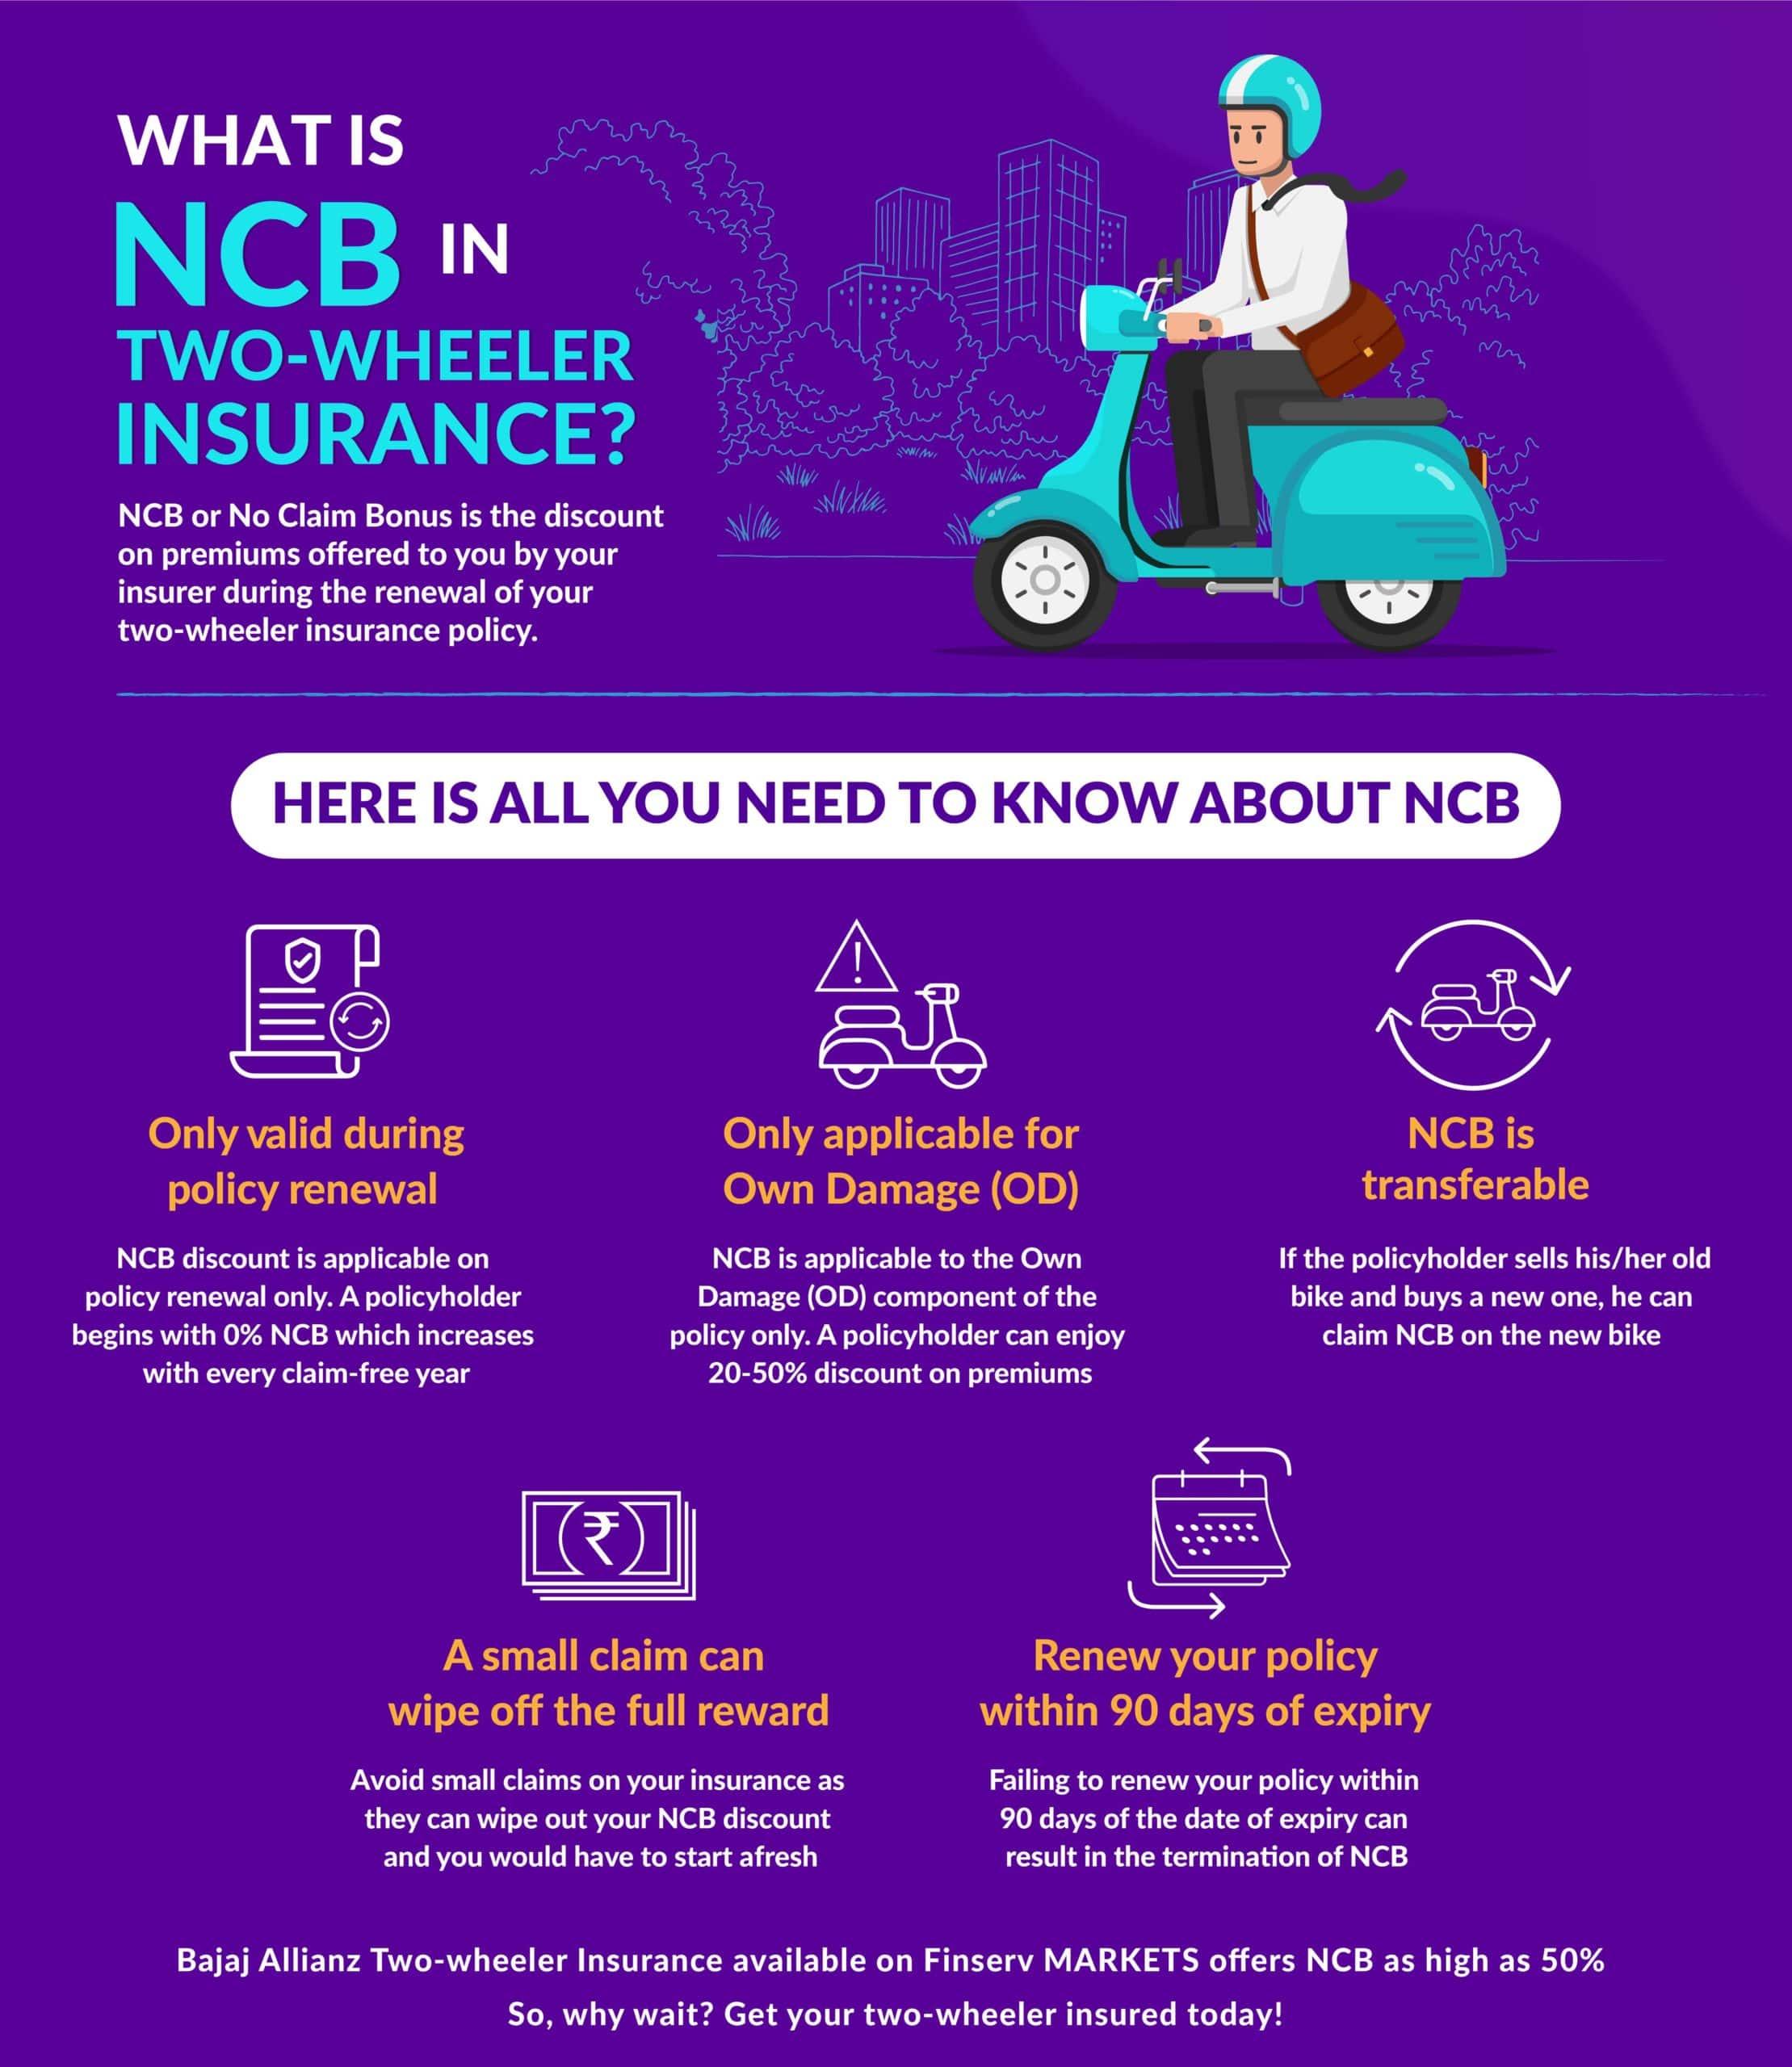 NCB in Two Wheeler Insurance